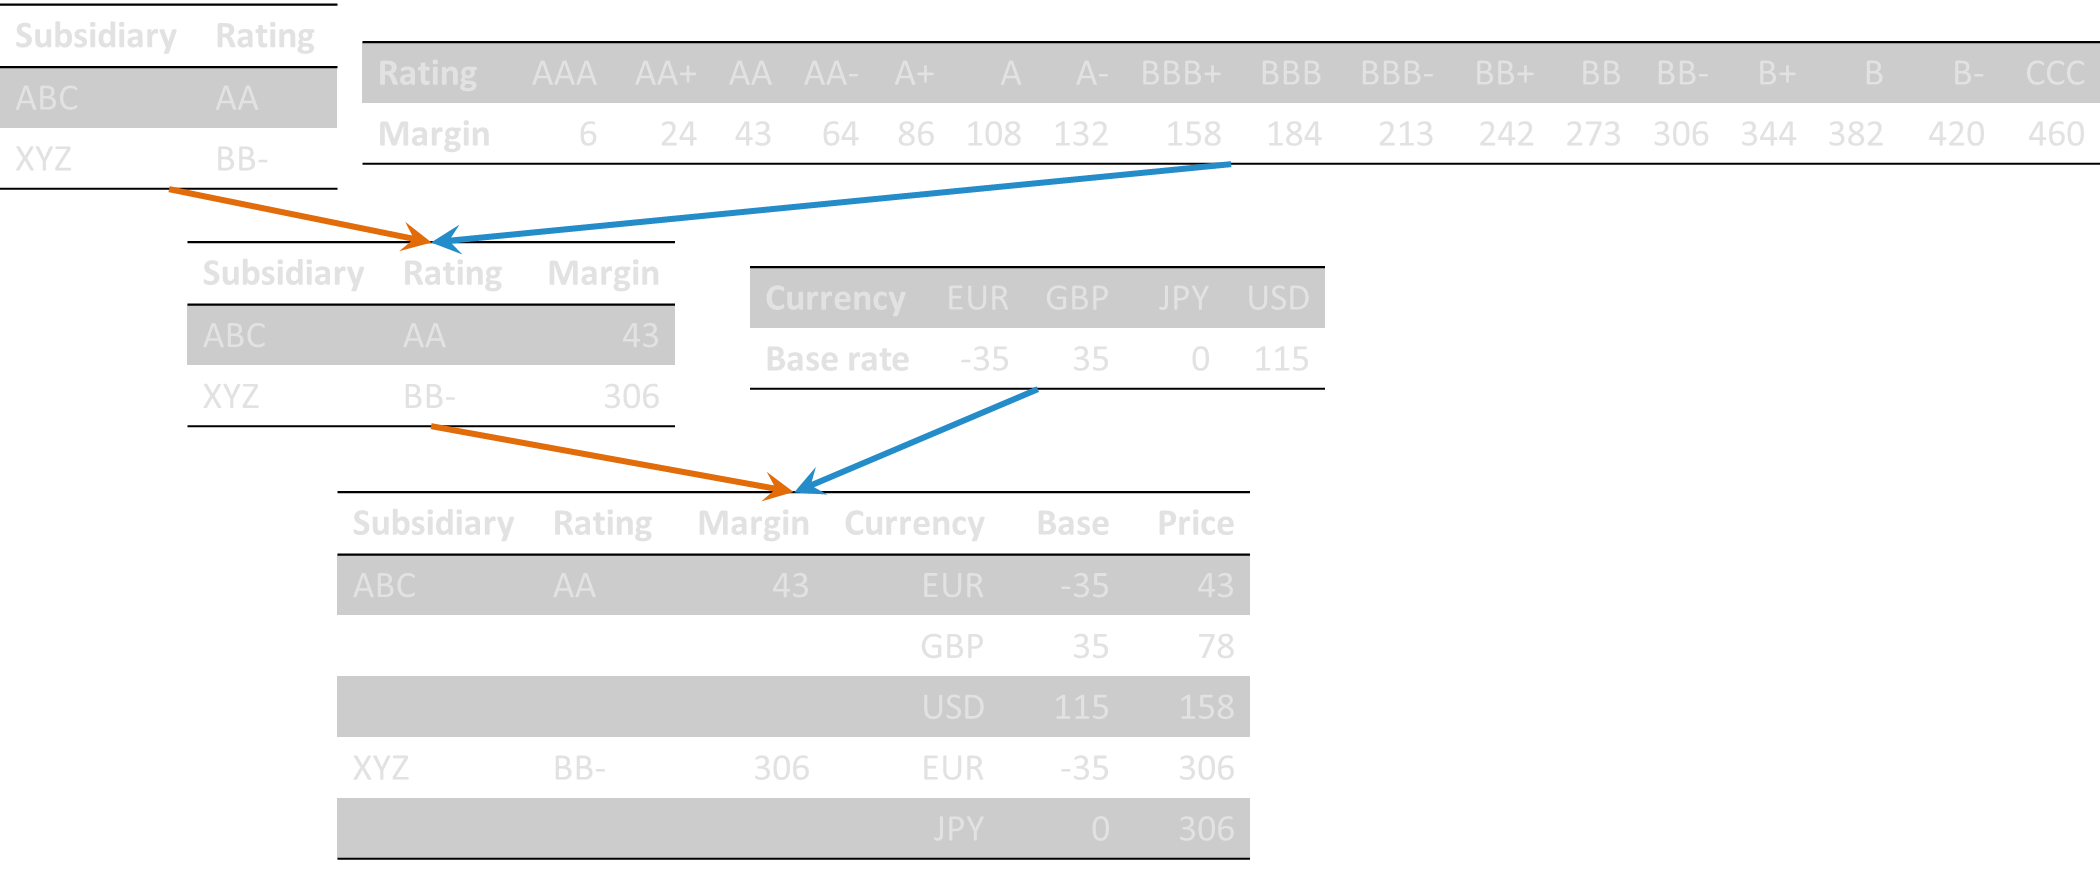 Intercompany Credit Ratings Model Transfer Pricing It Right